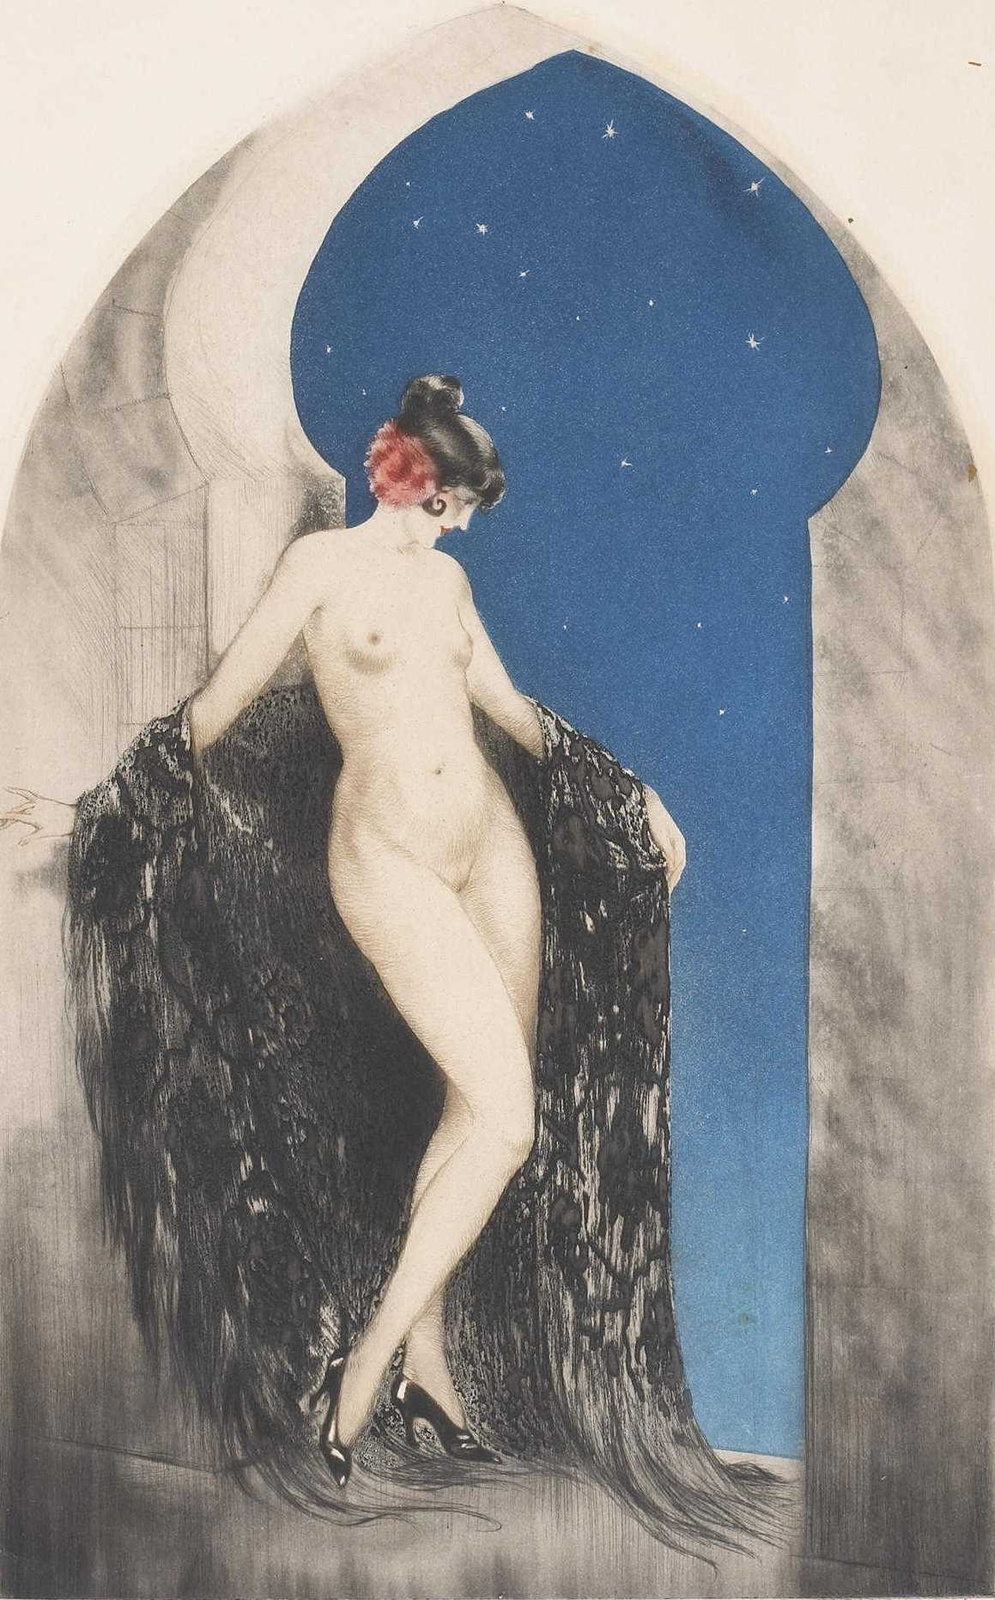 Icarus Louis France 1888 - 1950. Spanish nights. 1926